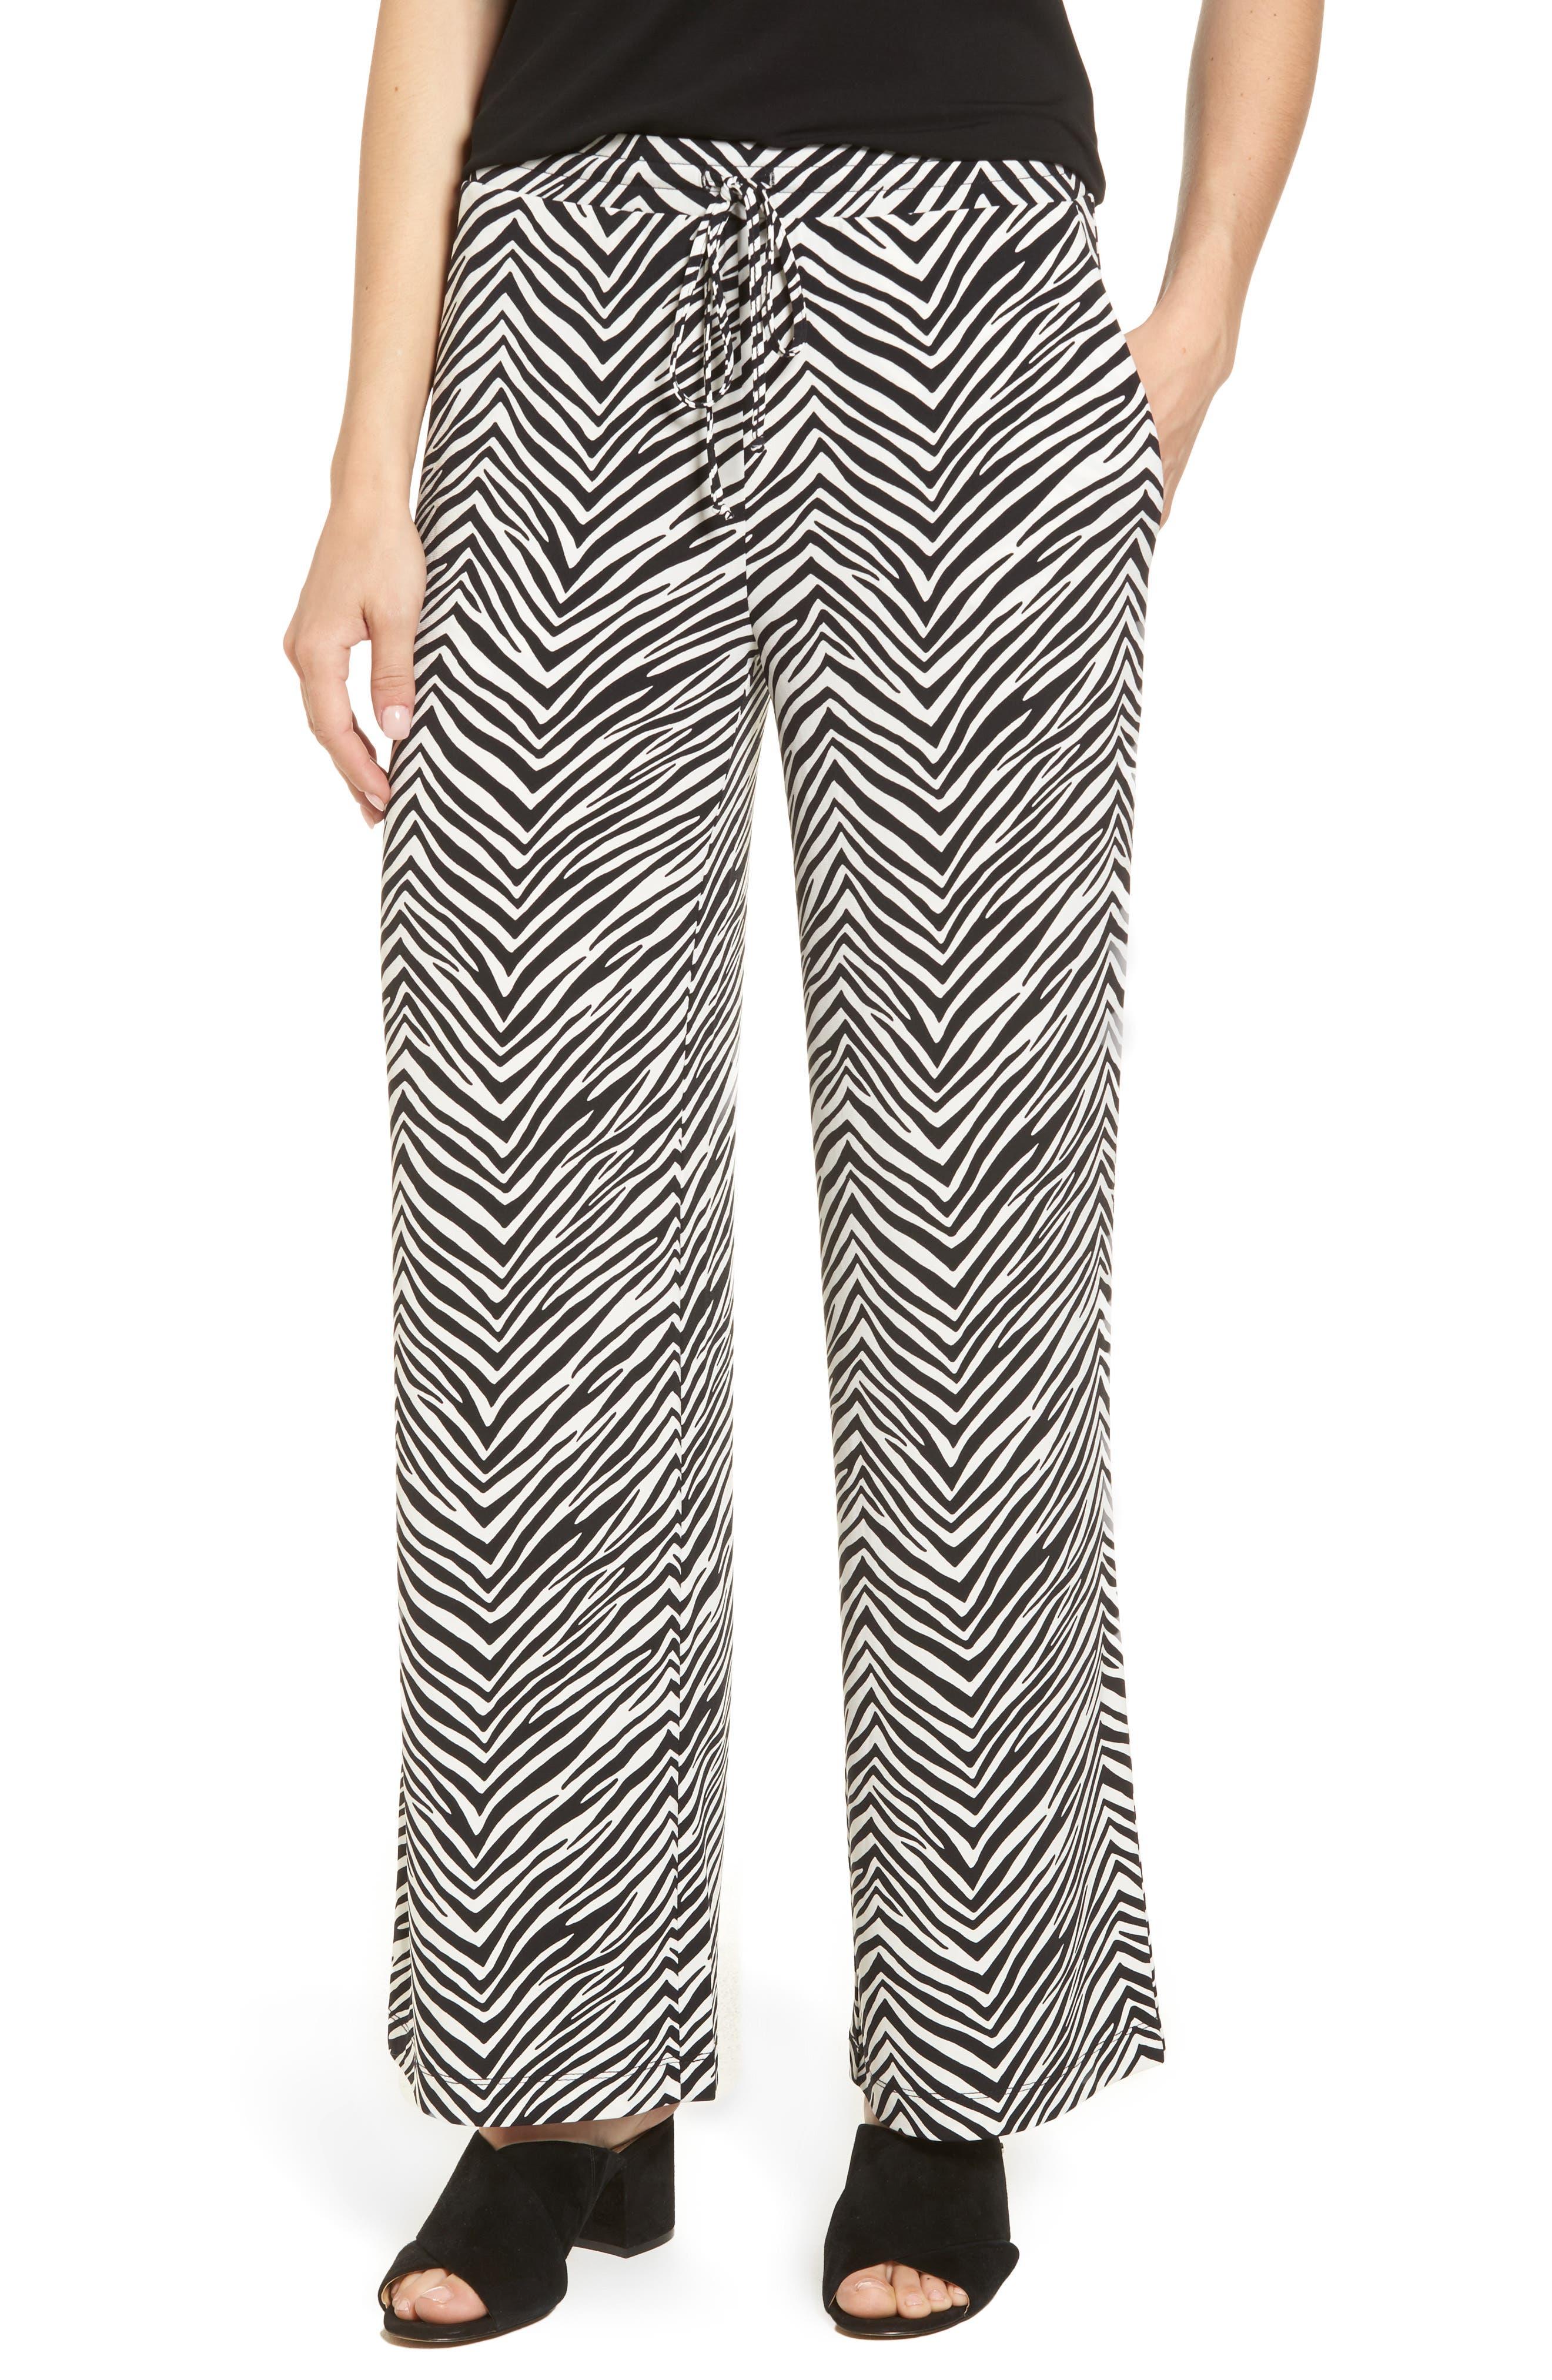 Zebra Print Drawstring Waist Pants,                             Main thumbnail 1, color,                             010